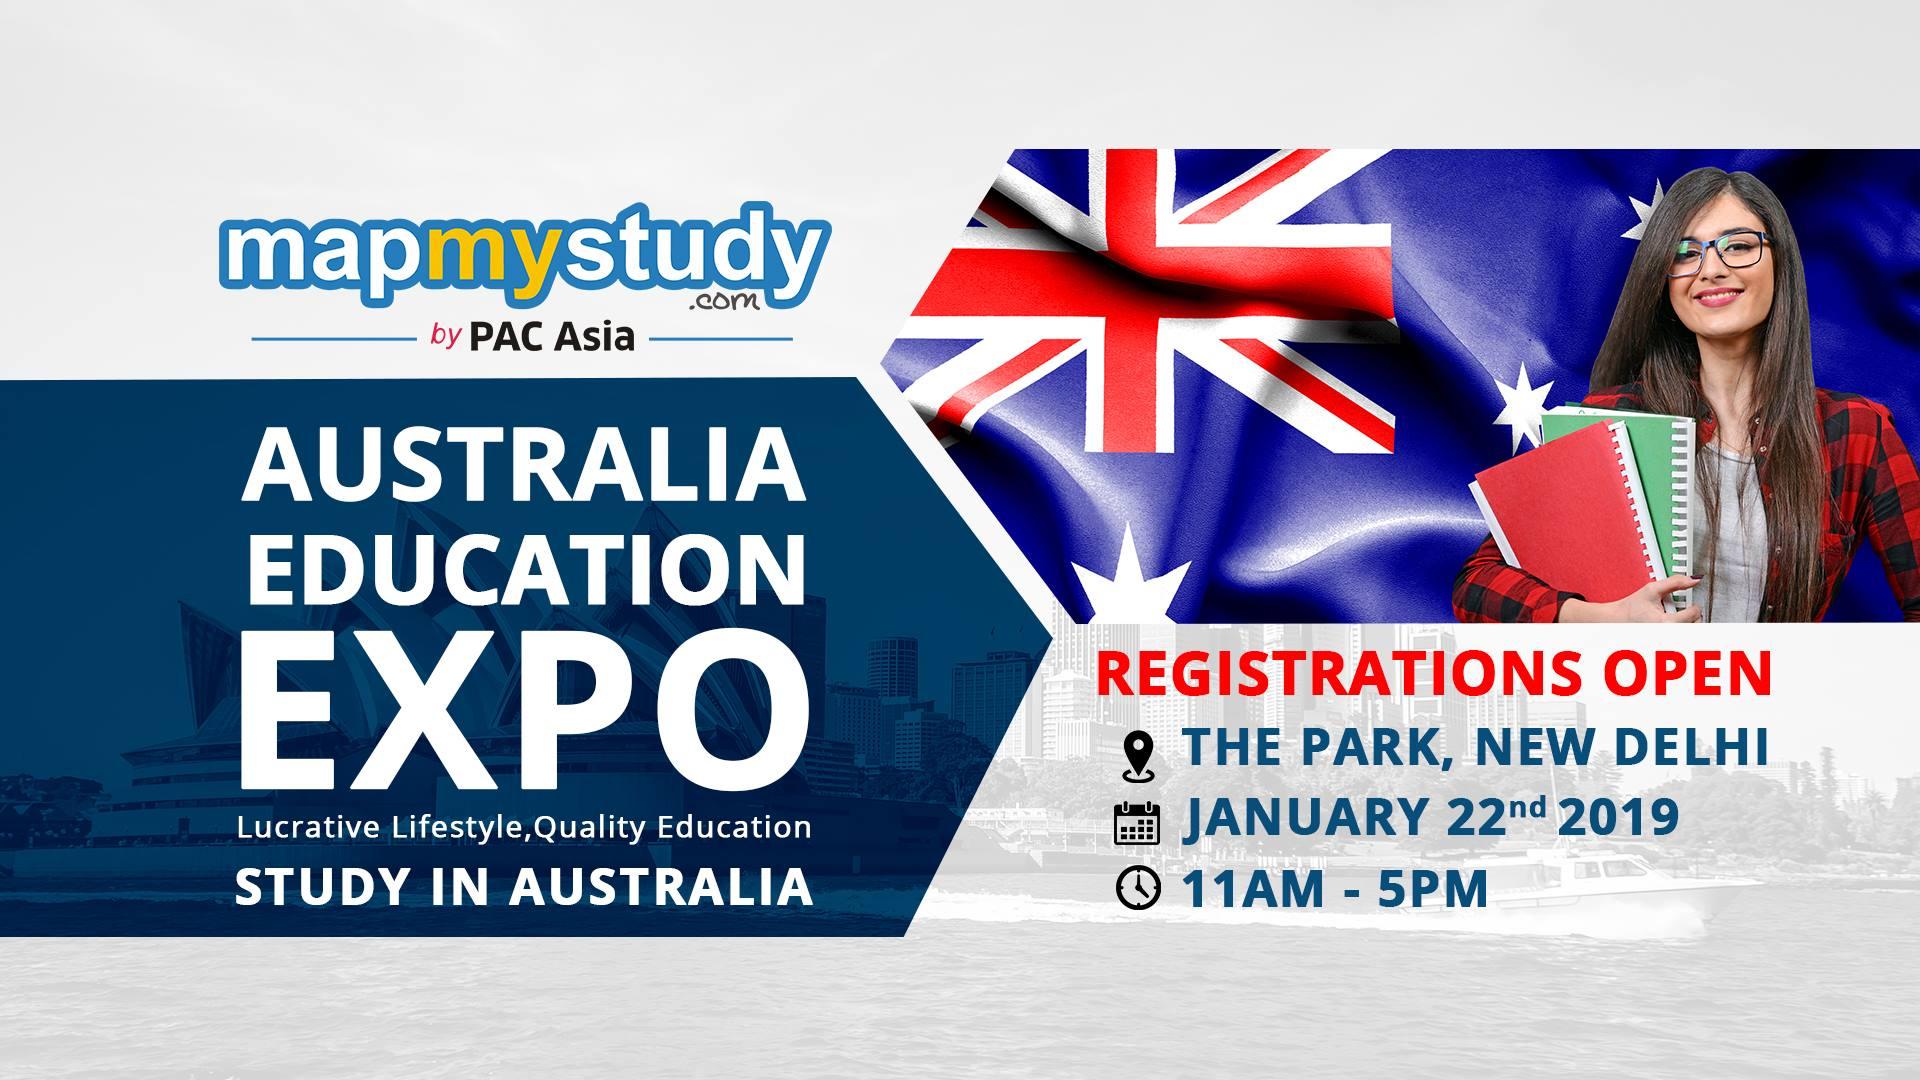 Australia Education Expo